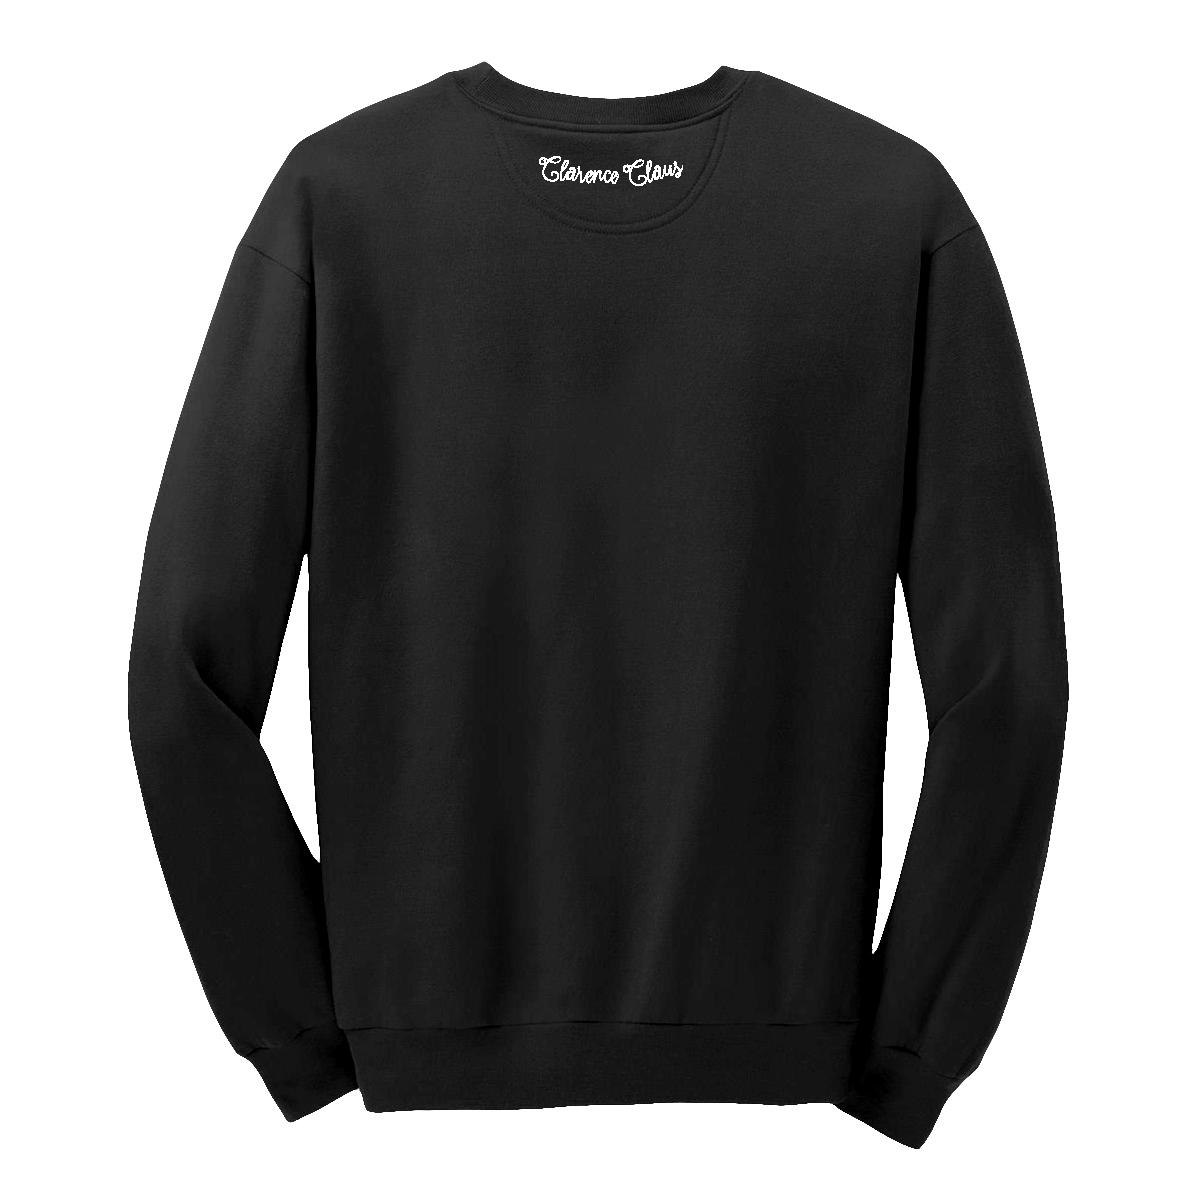 Clarence Claus™ Sweatshirt [Black]